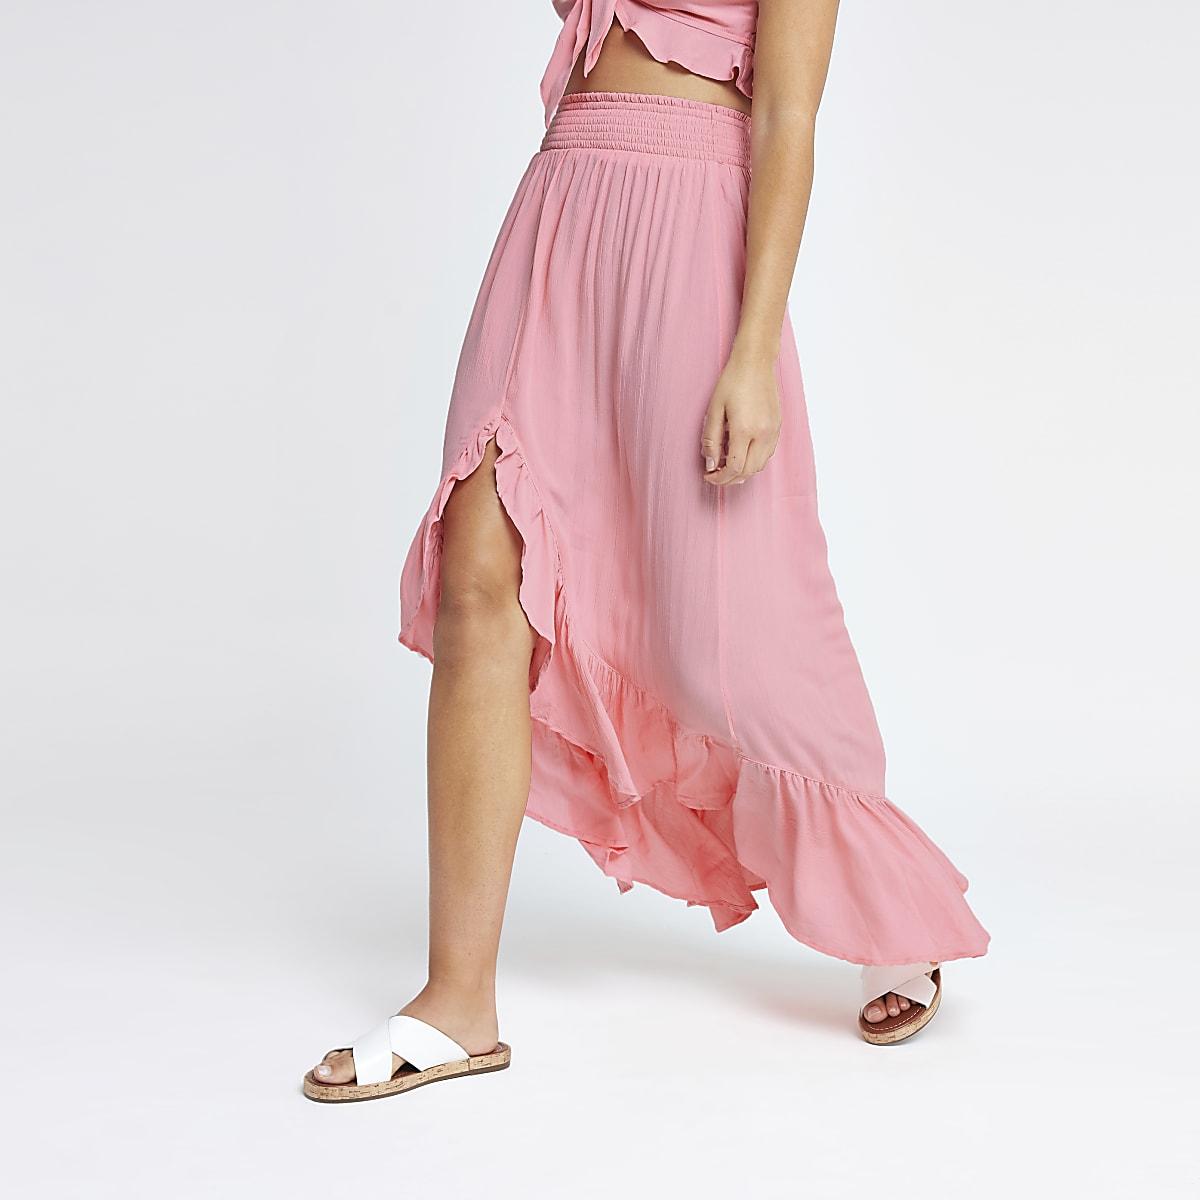 Pink shirred frill beach skirt